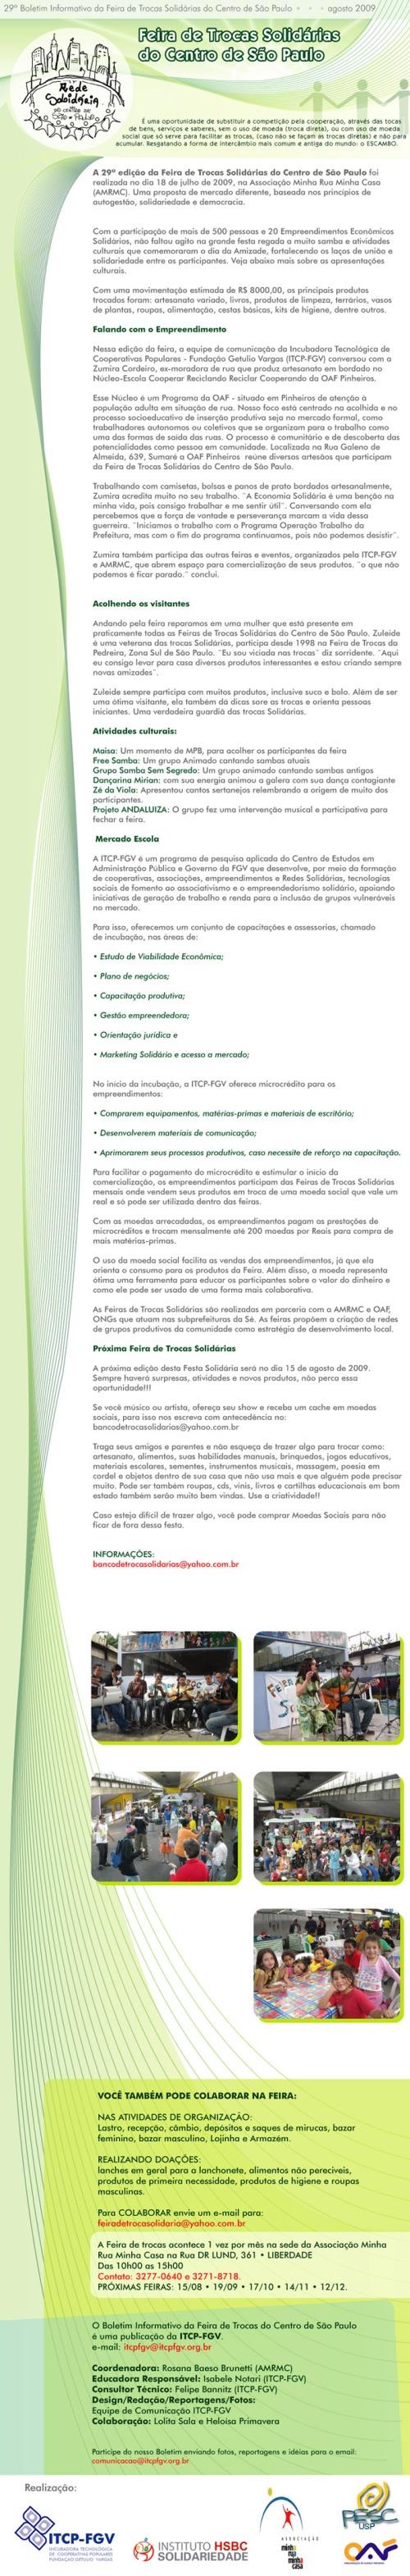 http://www.brasilautogestionario.org/2009/08/boletim-da-29%C2%AA-edicao-da-feira-de-trocas-solidarias-do-centro-de-sao-paulo/